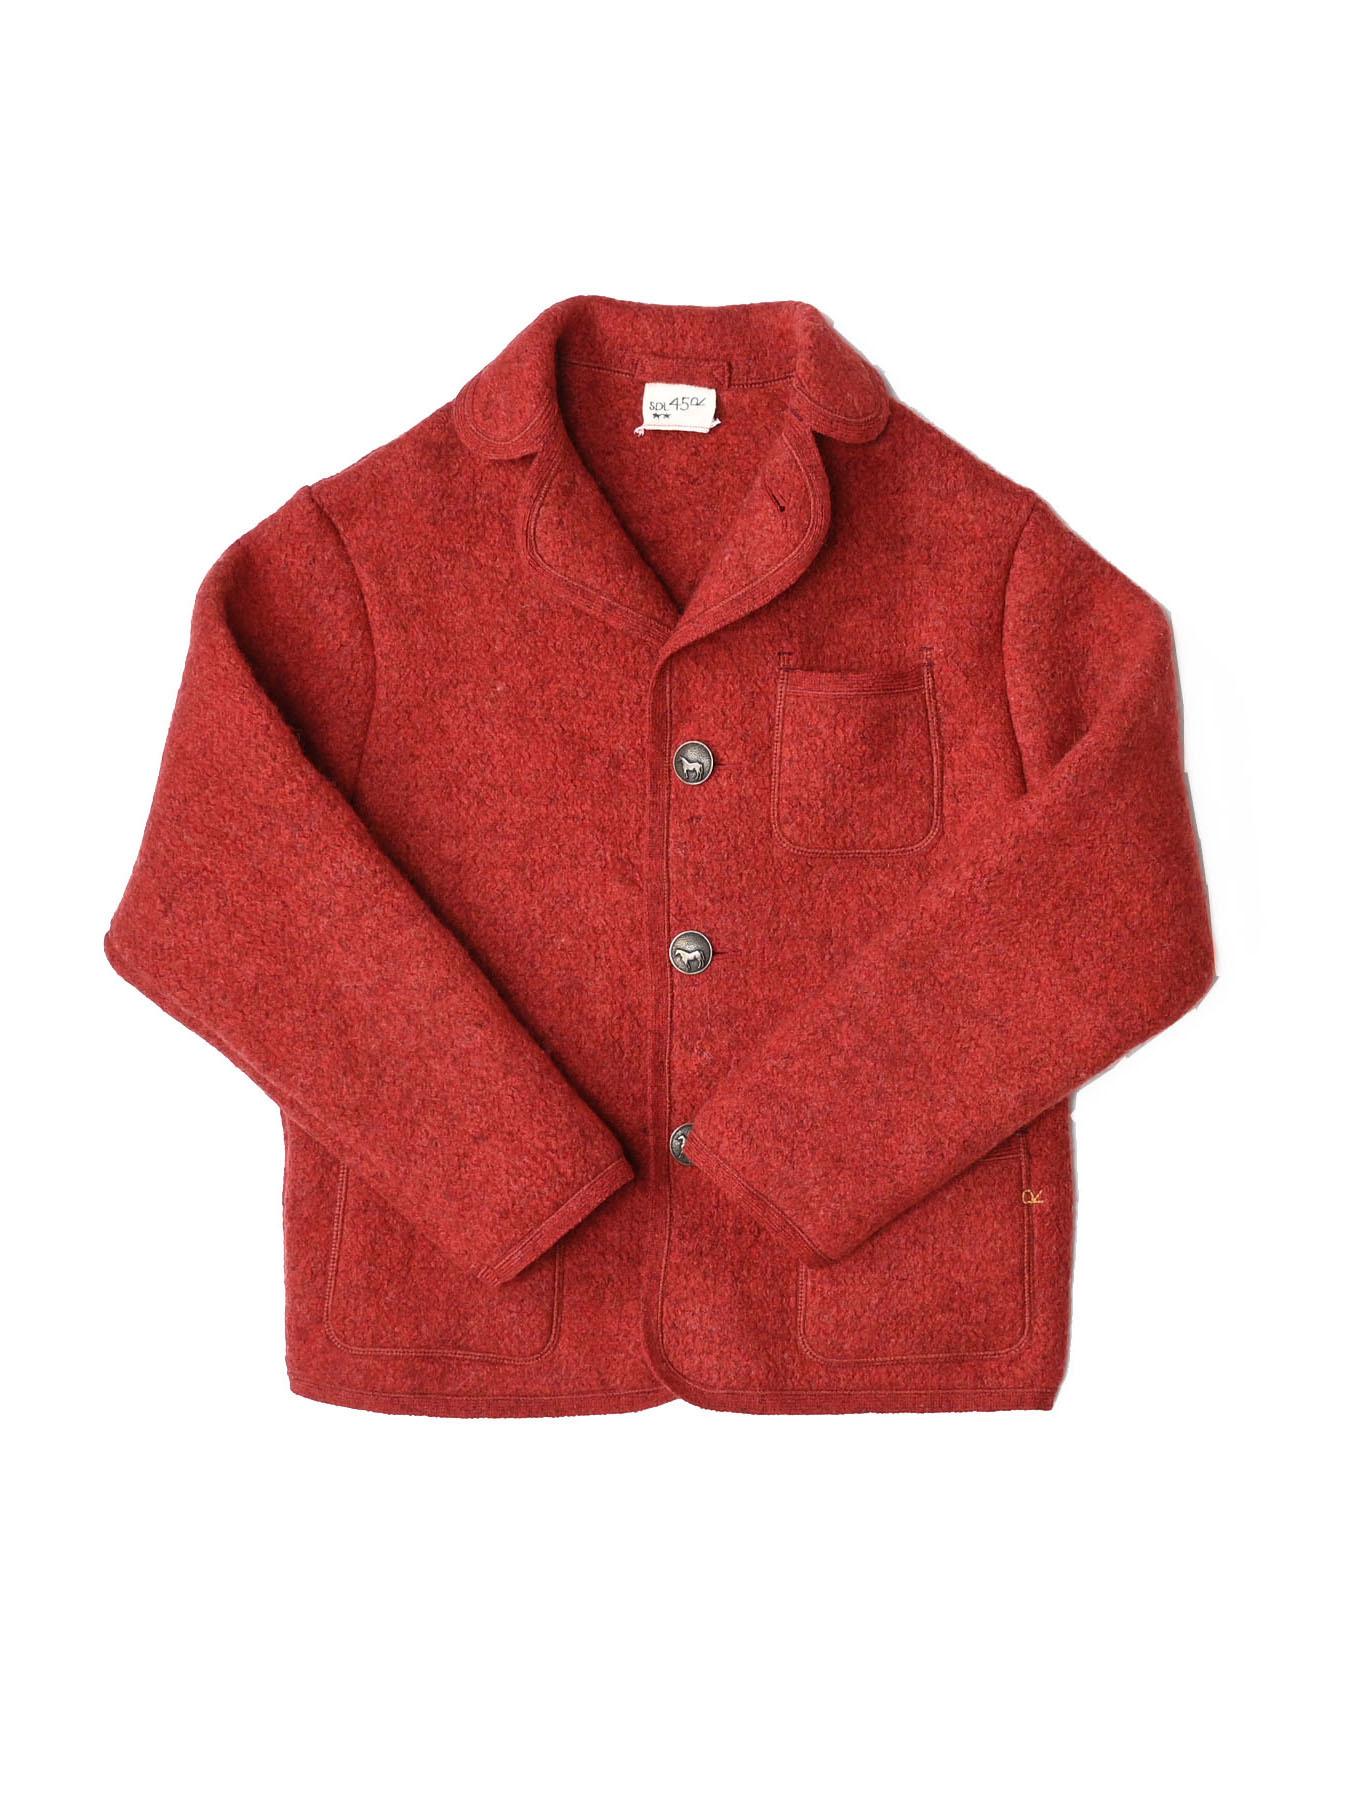 Cotton Shetland 908 Tyrolean Jacket-4